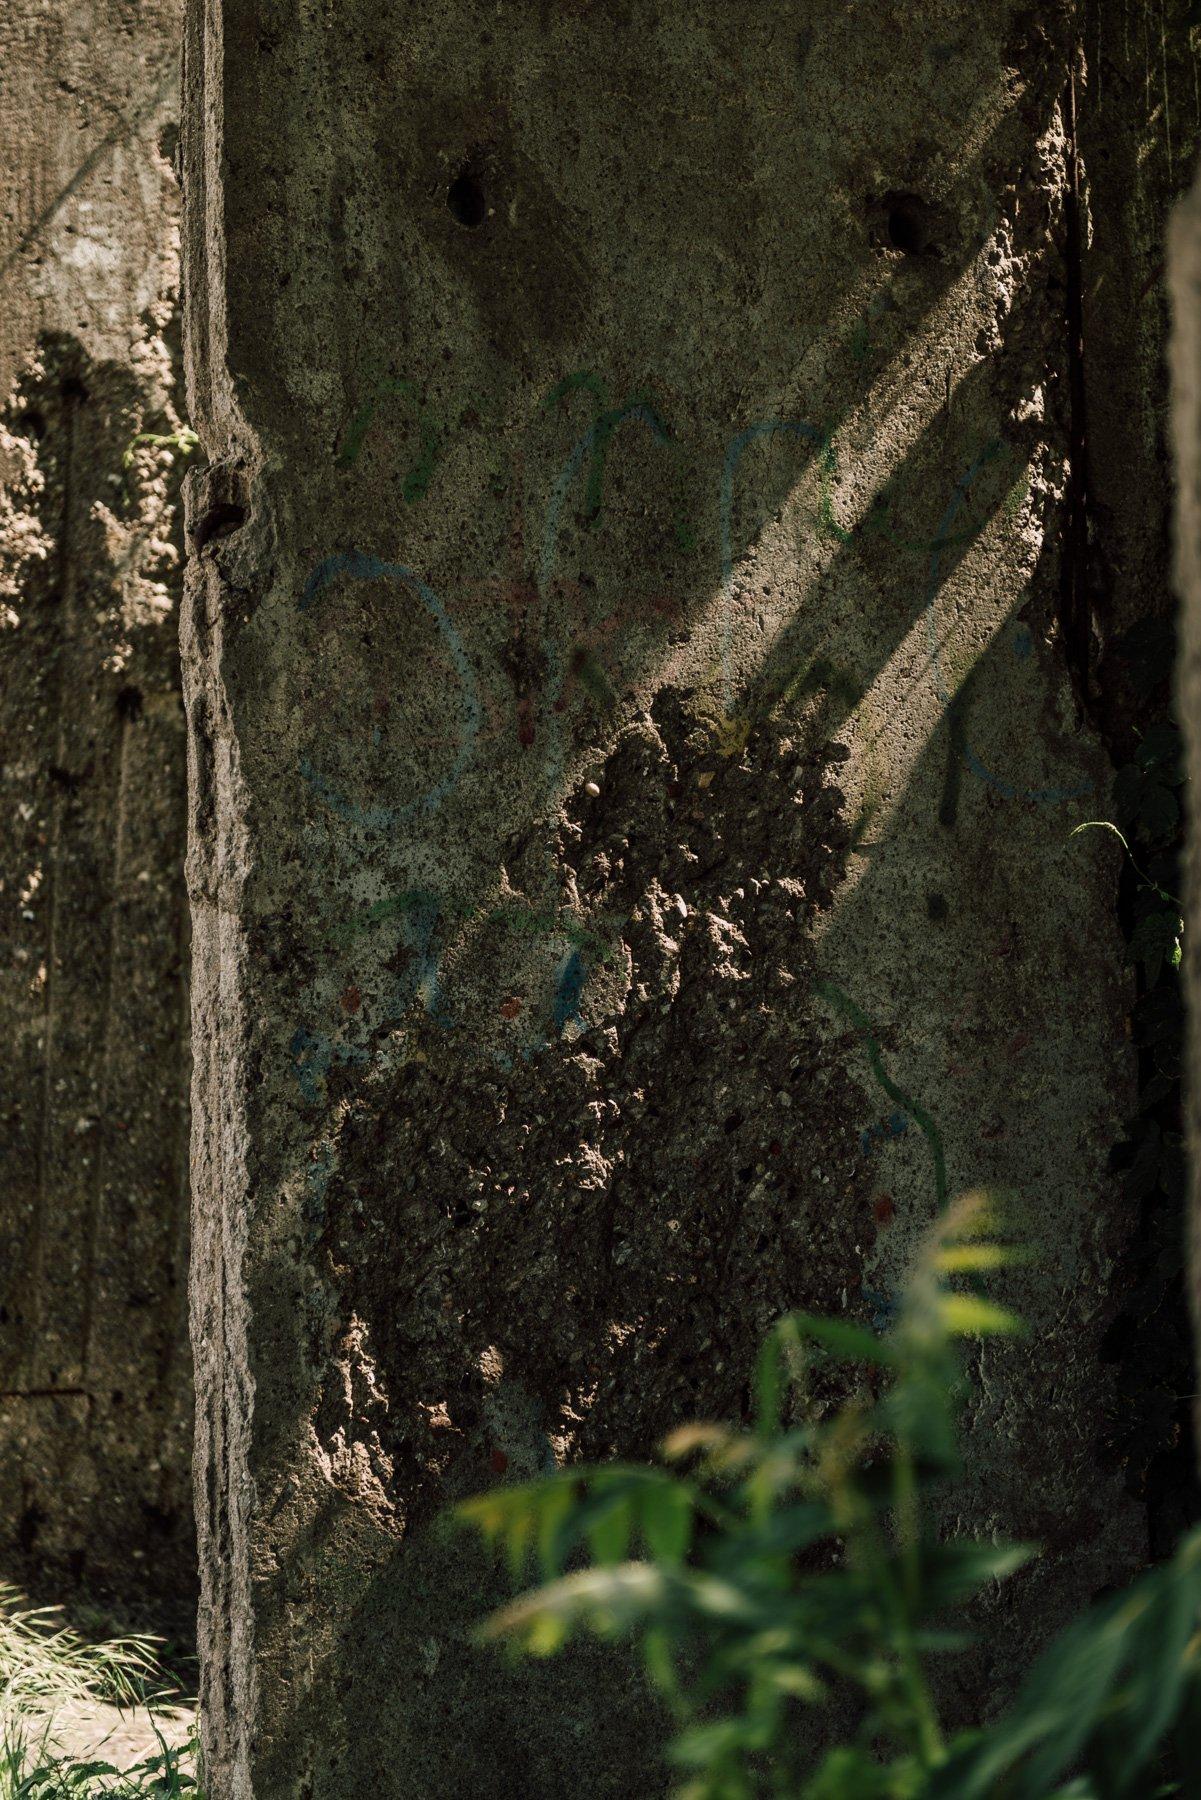 ignant-berlin-wall-biennale-5199